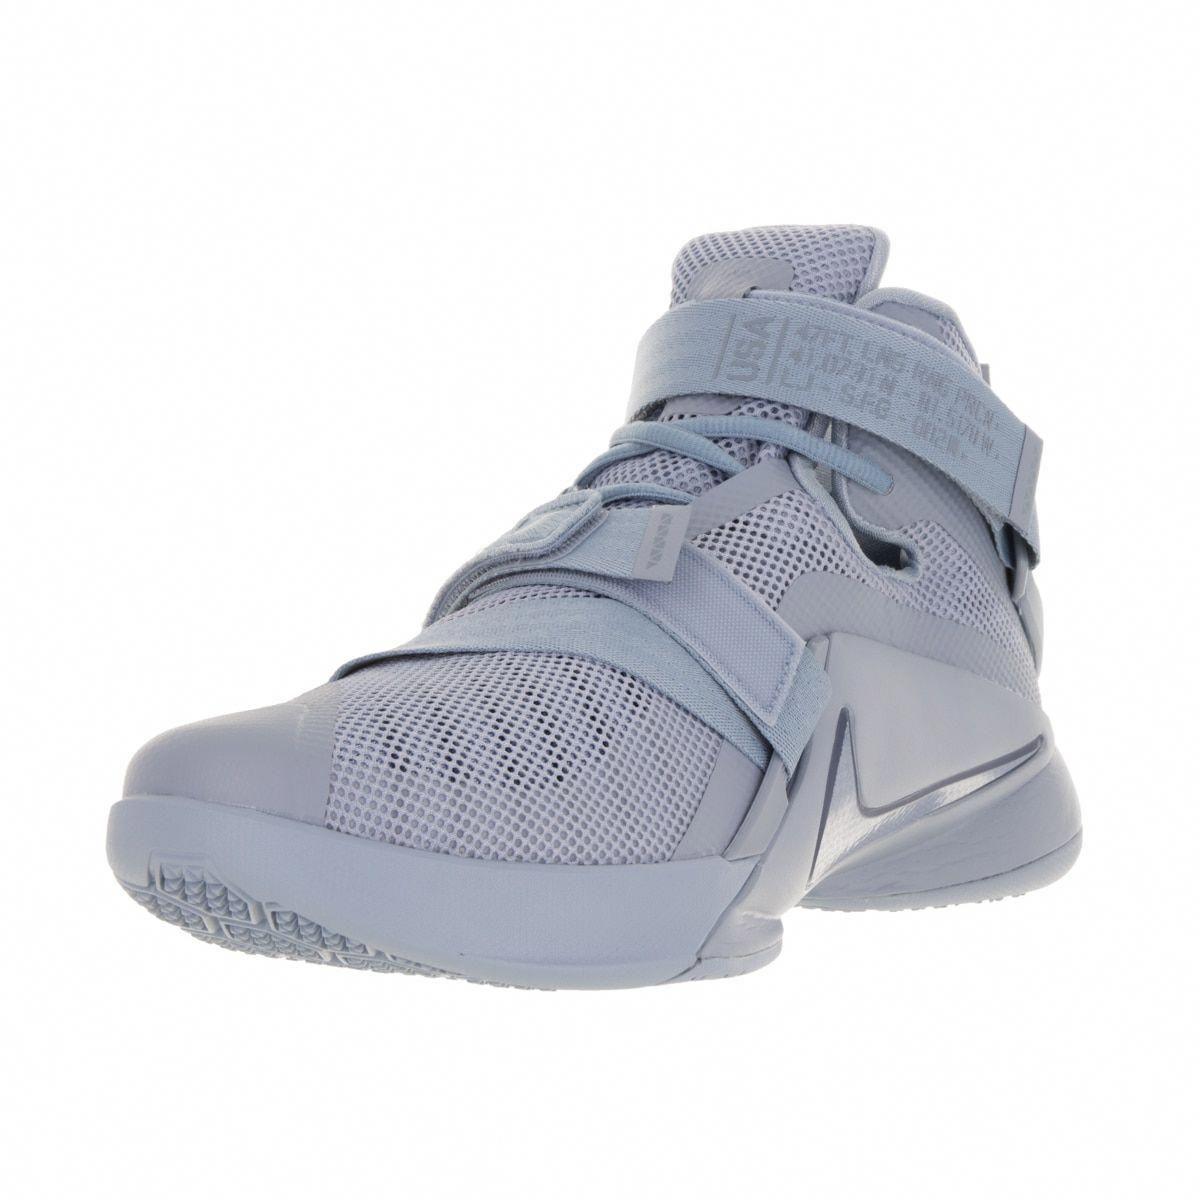 22fc666182d Nike Men s Lebron Soldier IX PRM Blue  Blue  Sqdrn Blue Basketball Shoe   basketballonline